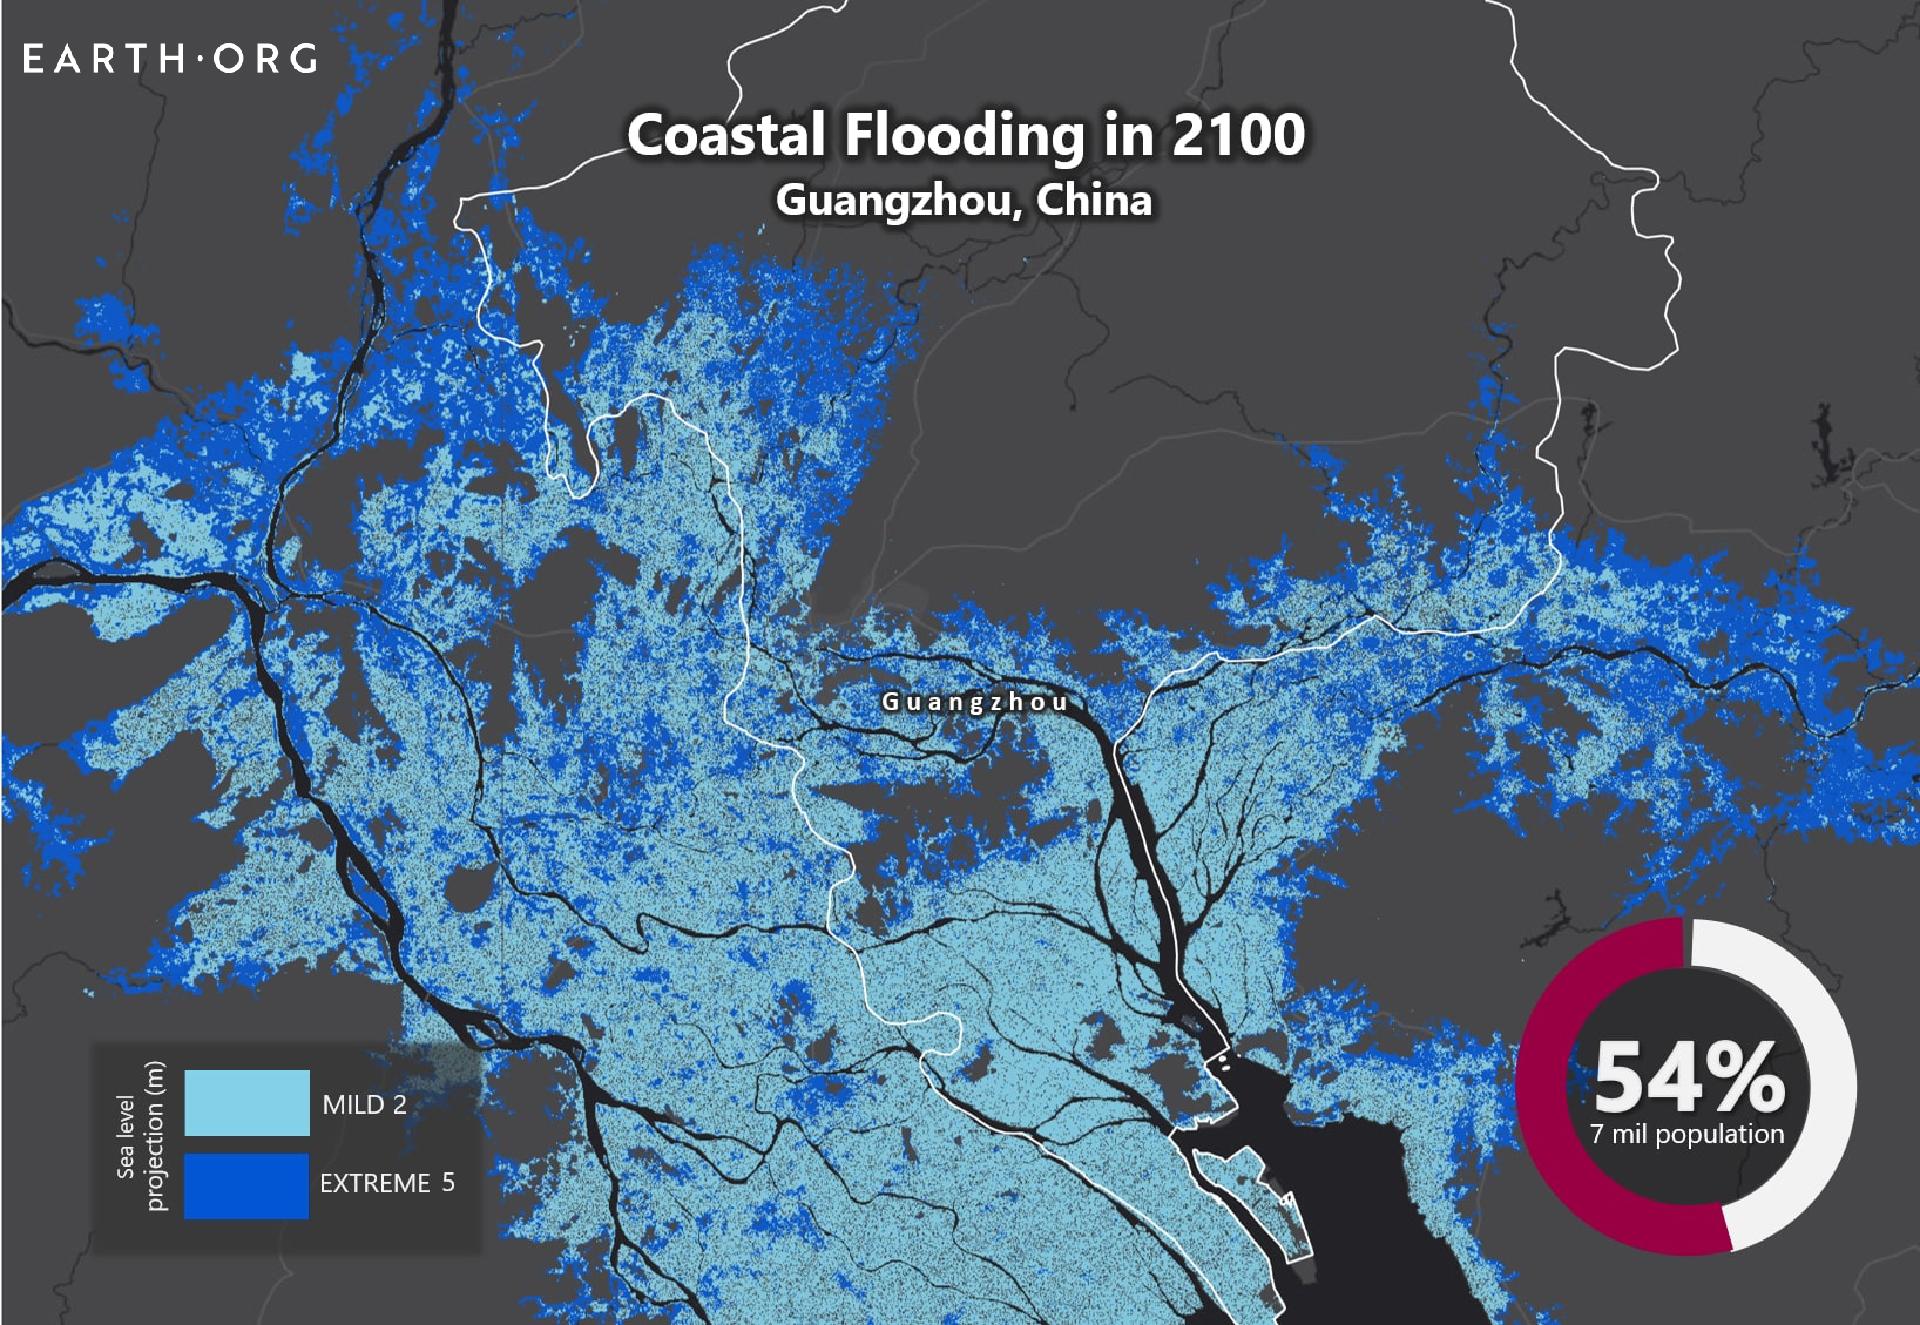 sea level rise by 2100 Guangzhou